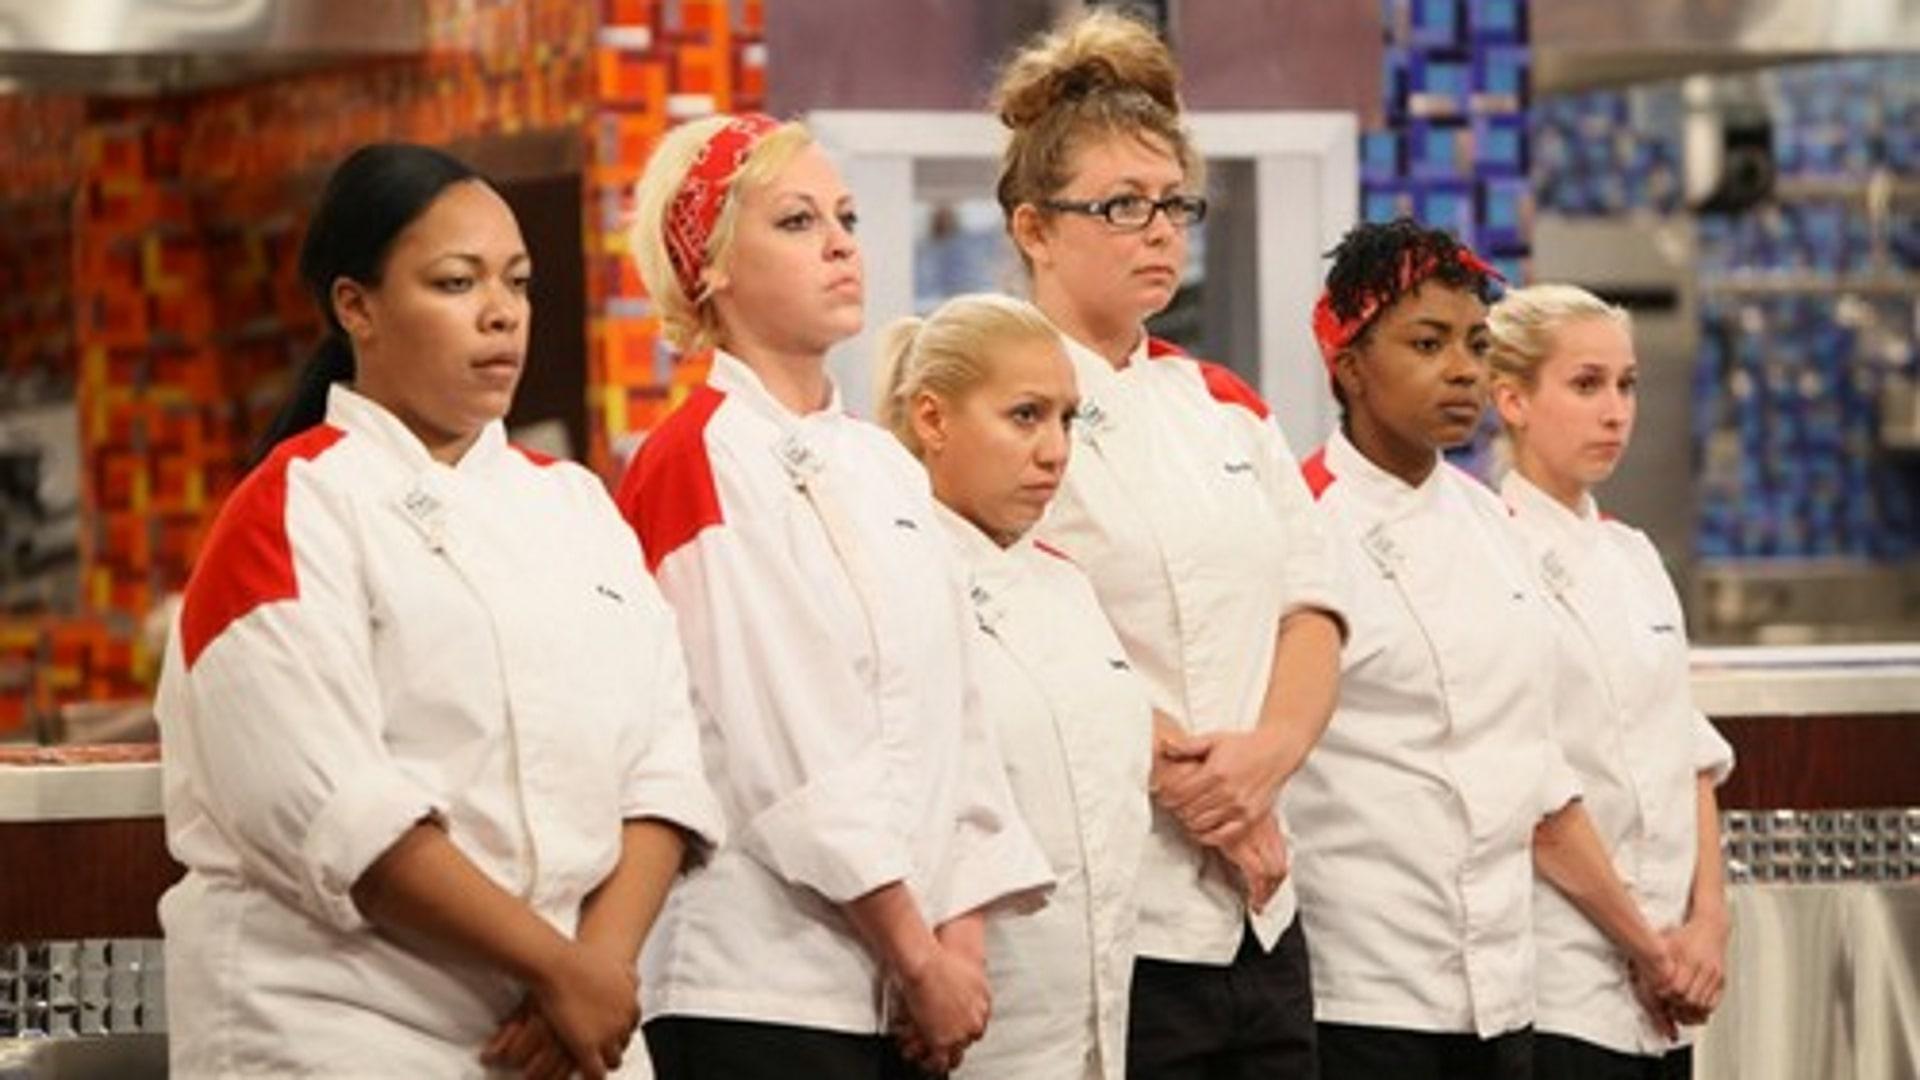 Hell's Kitchen - Season 16 Watch Free online streaming on PrimeWire